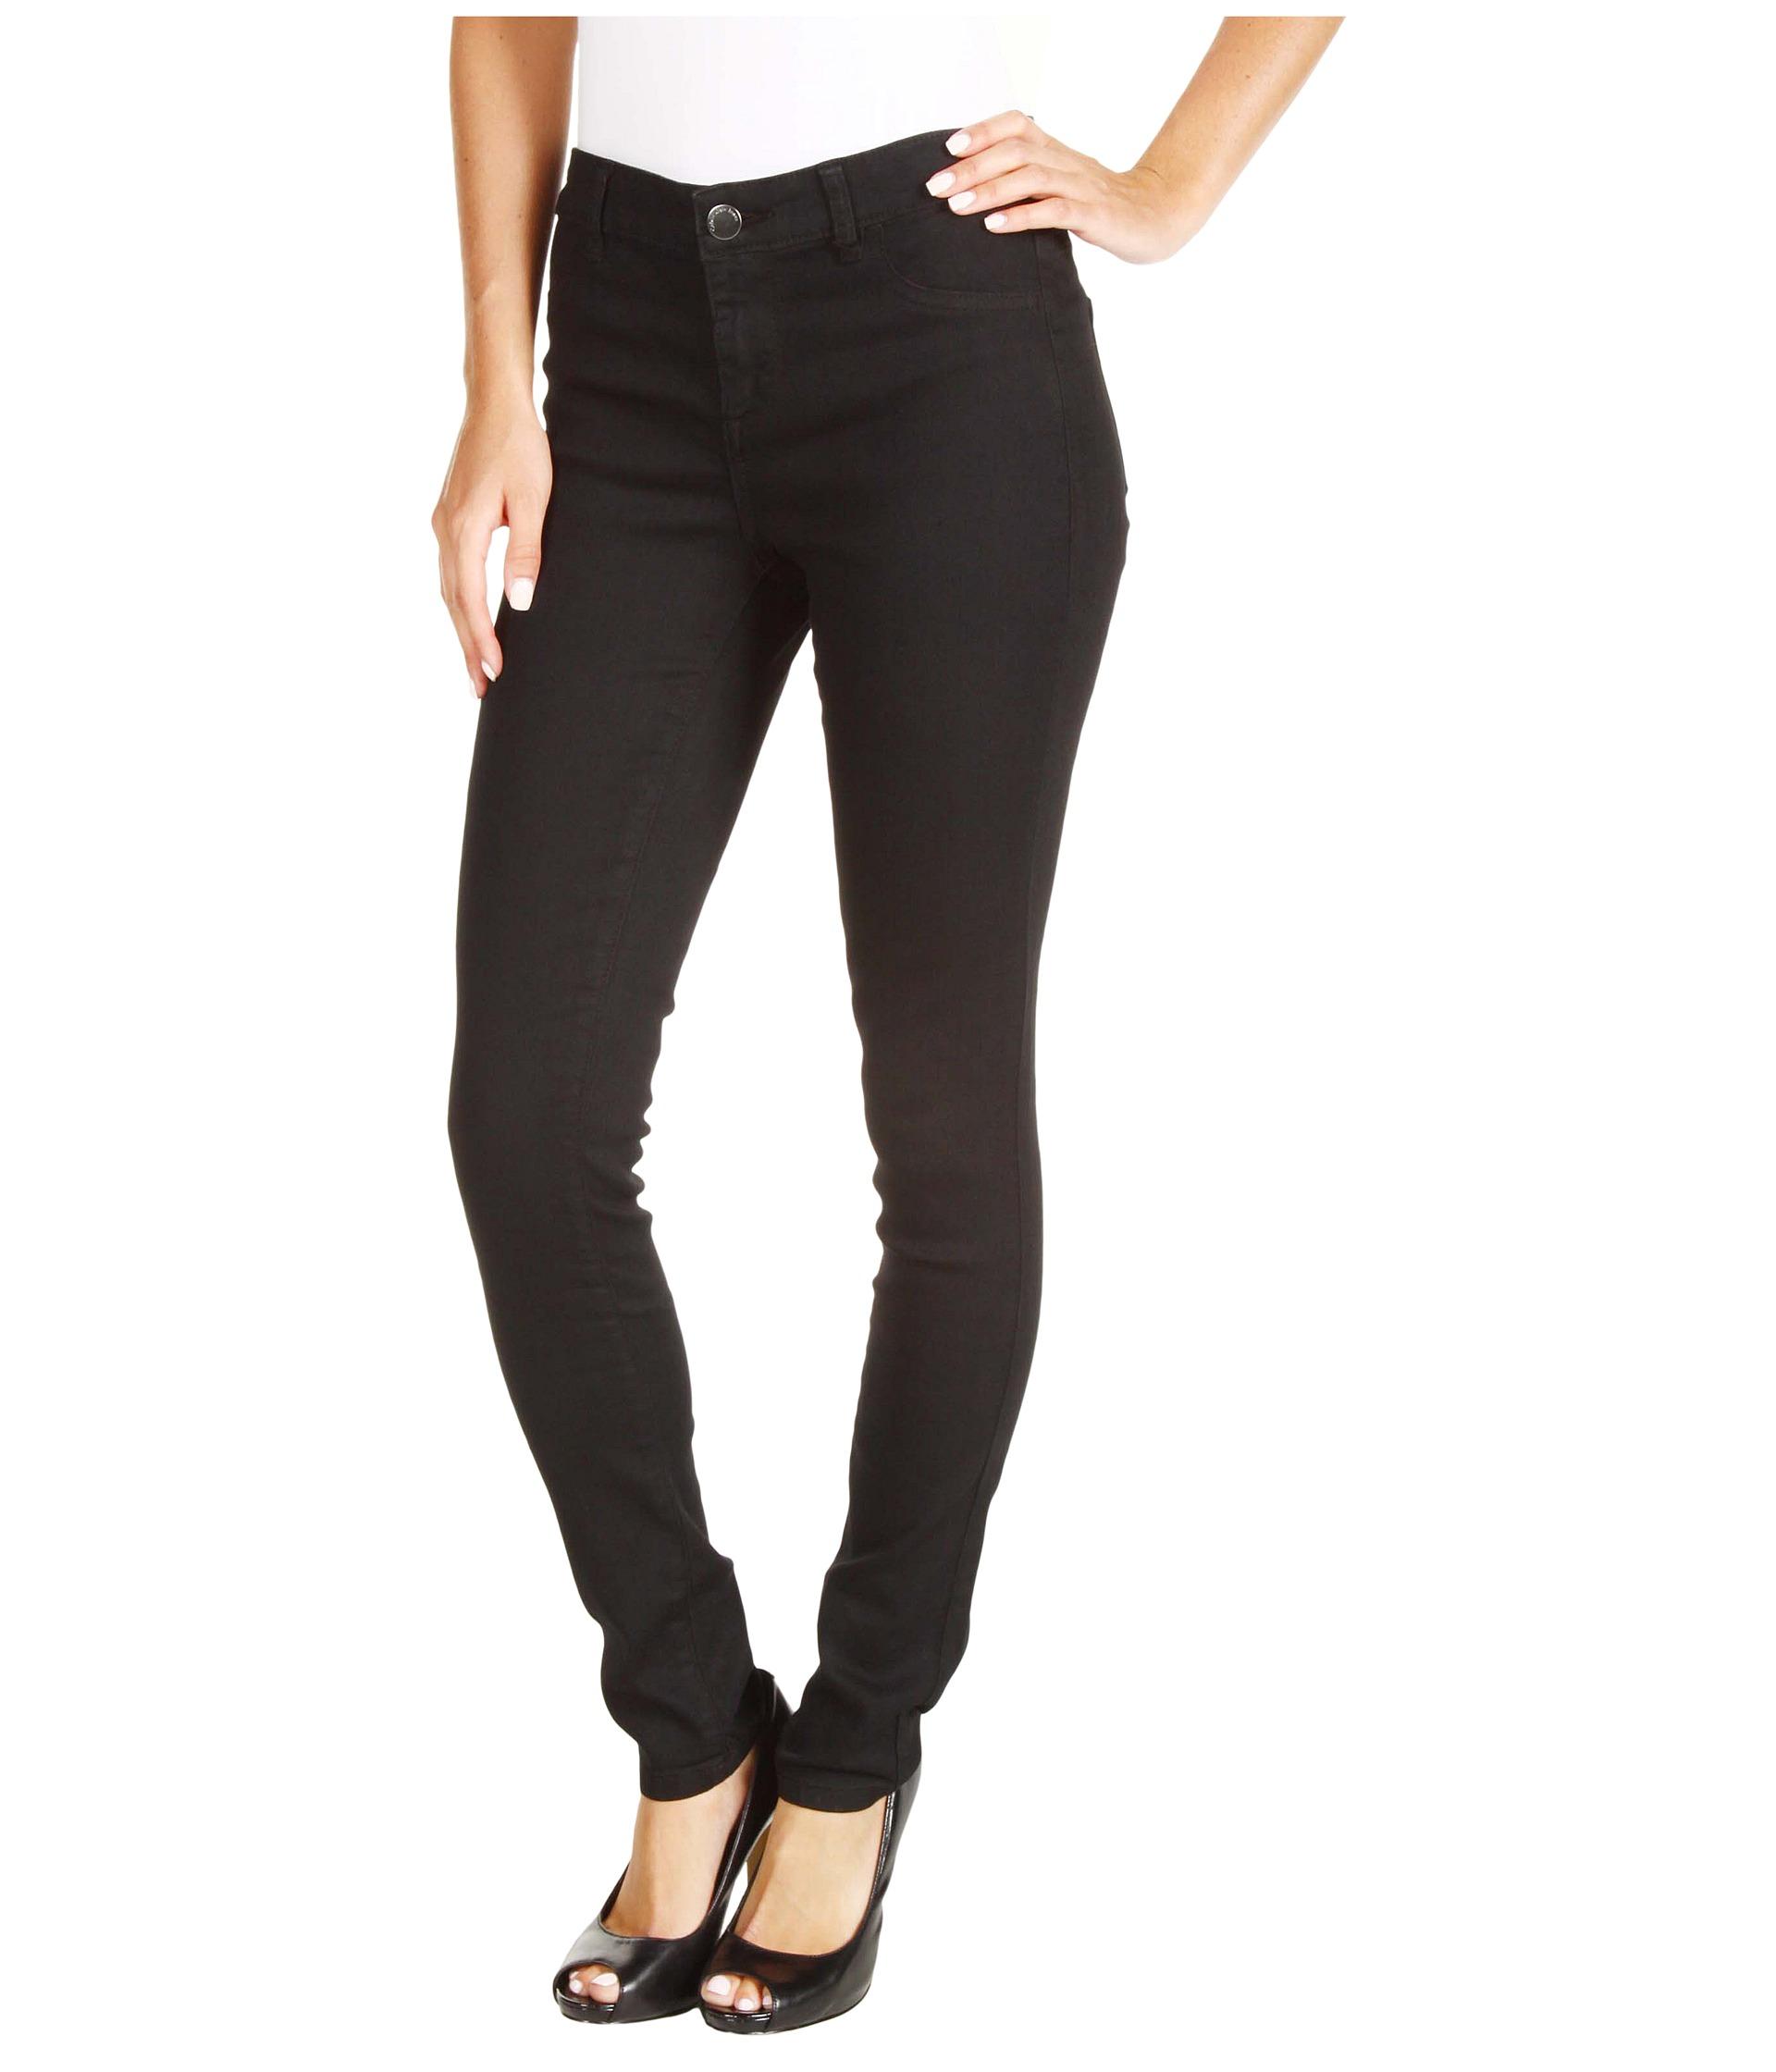 calvin klein jeans powerstretch denim legging in black shipped free at zappos. Black Bedroom Furniture Sets. Home Design Ideas